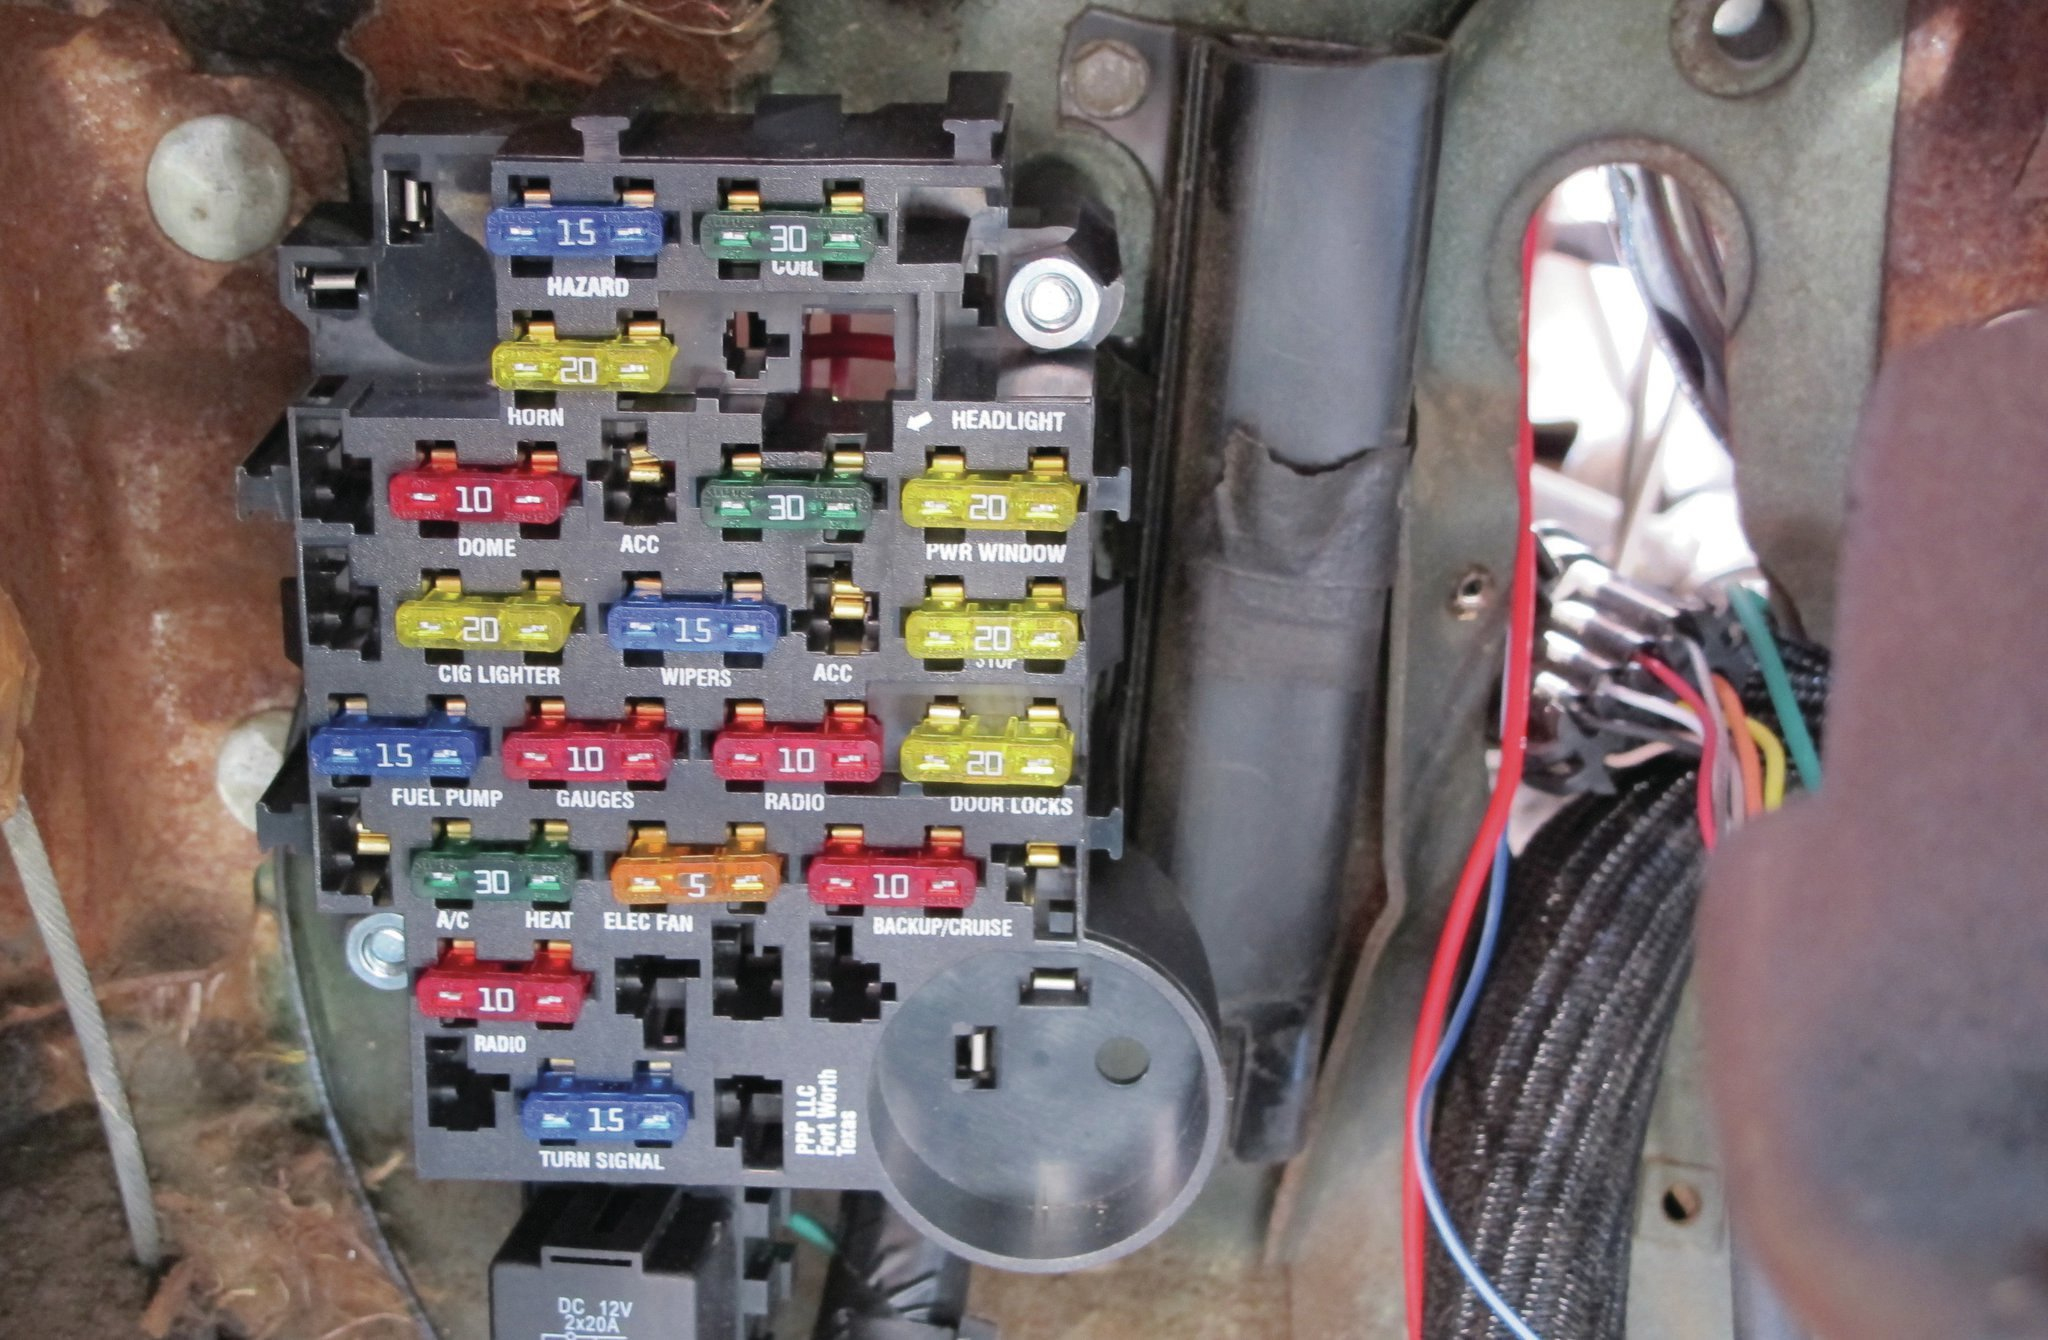 Painless Fuel Pump Relay Wiring Diagram | Wiring Diagram - Painless Wiring Diagram